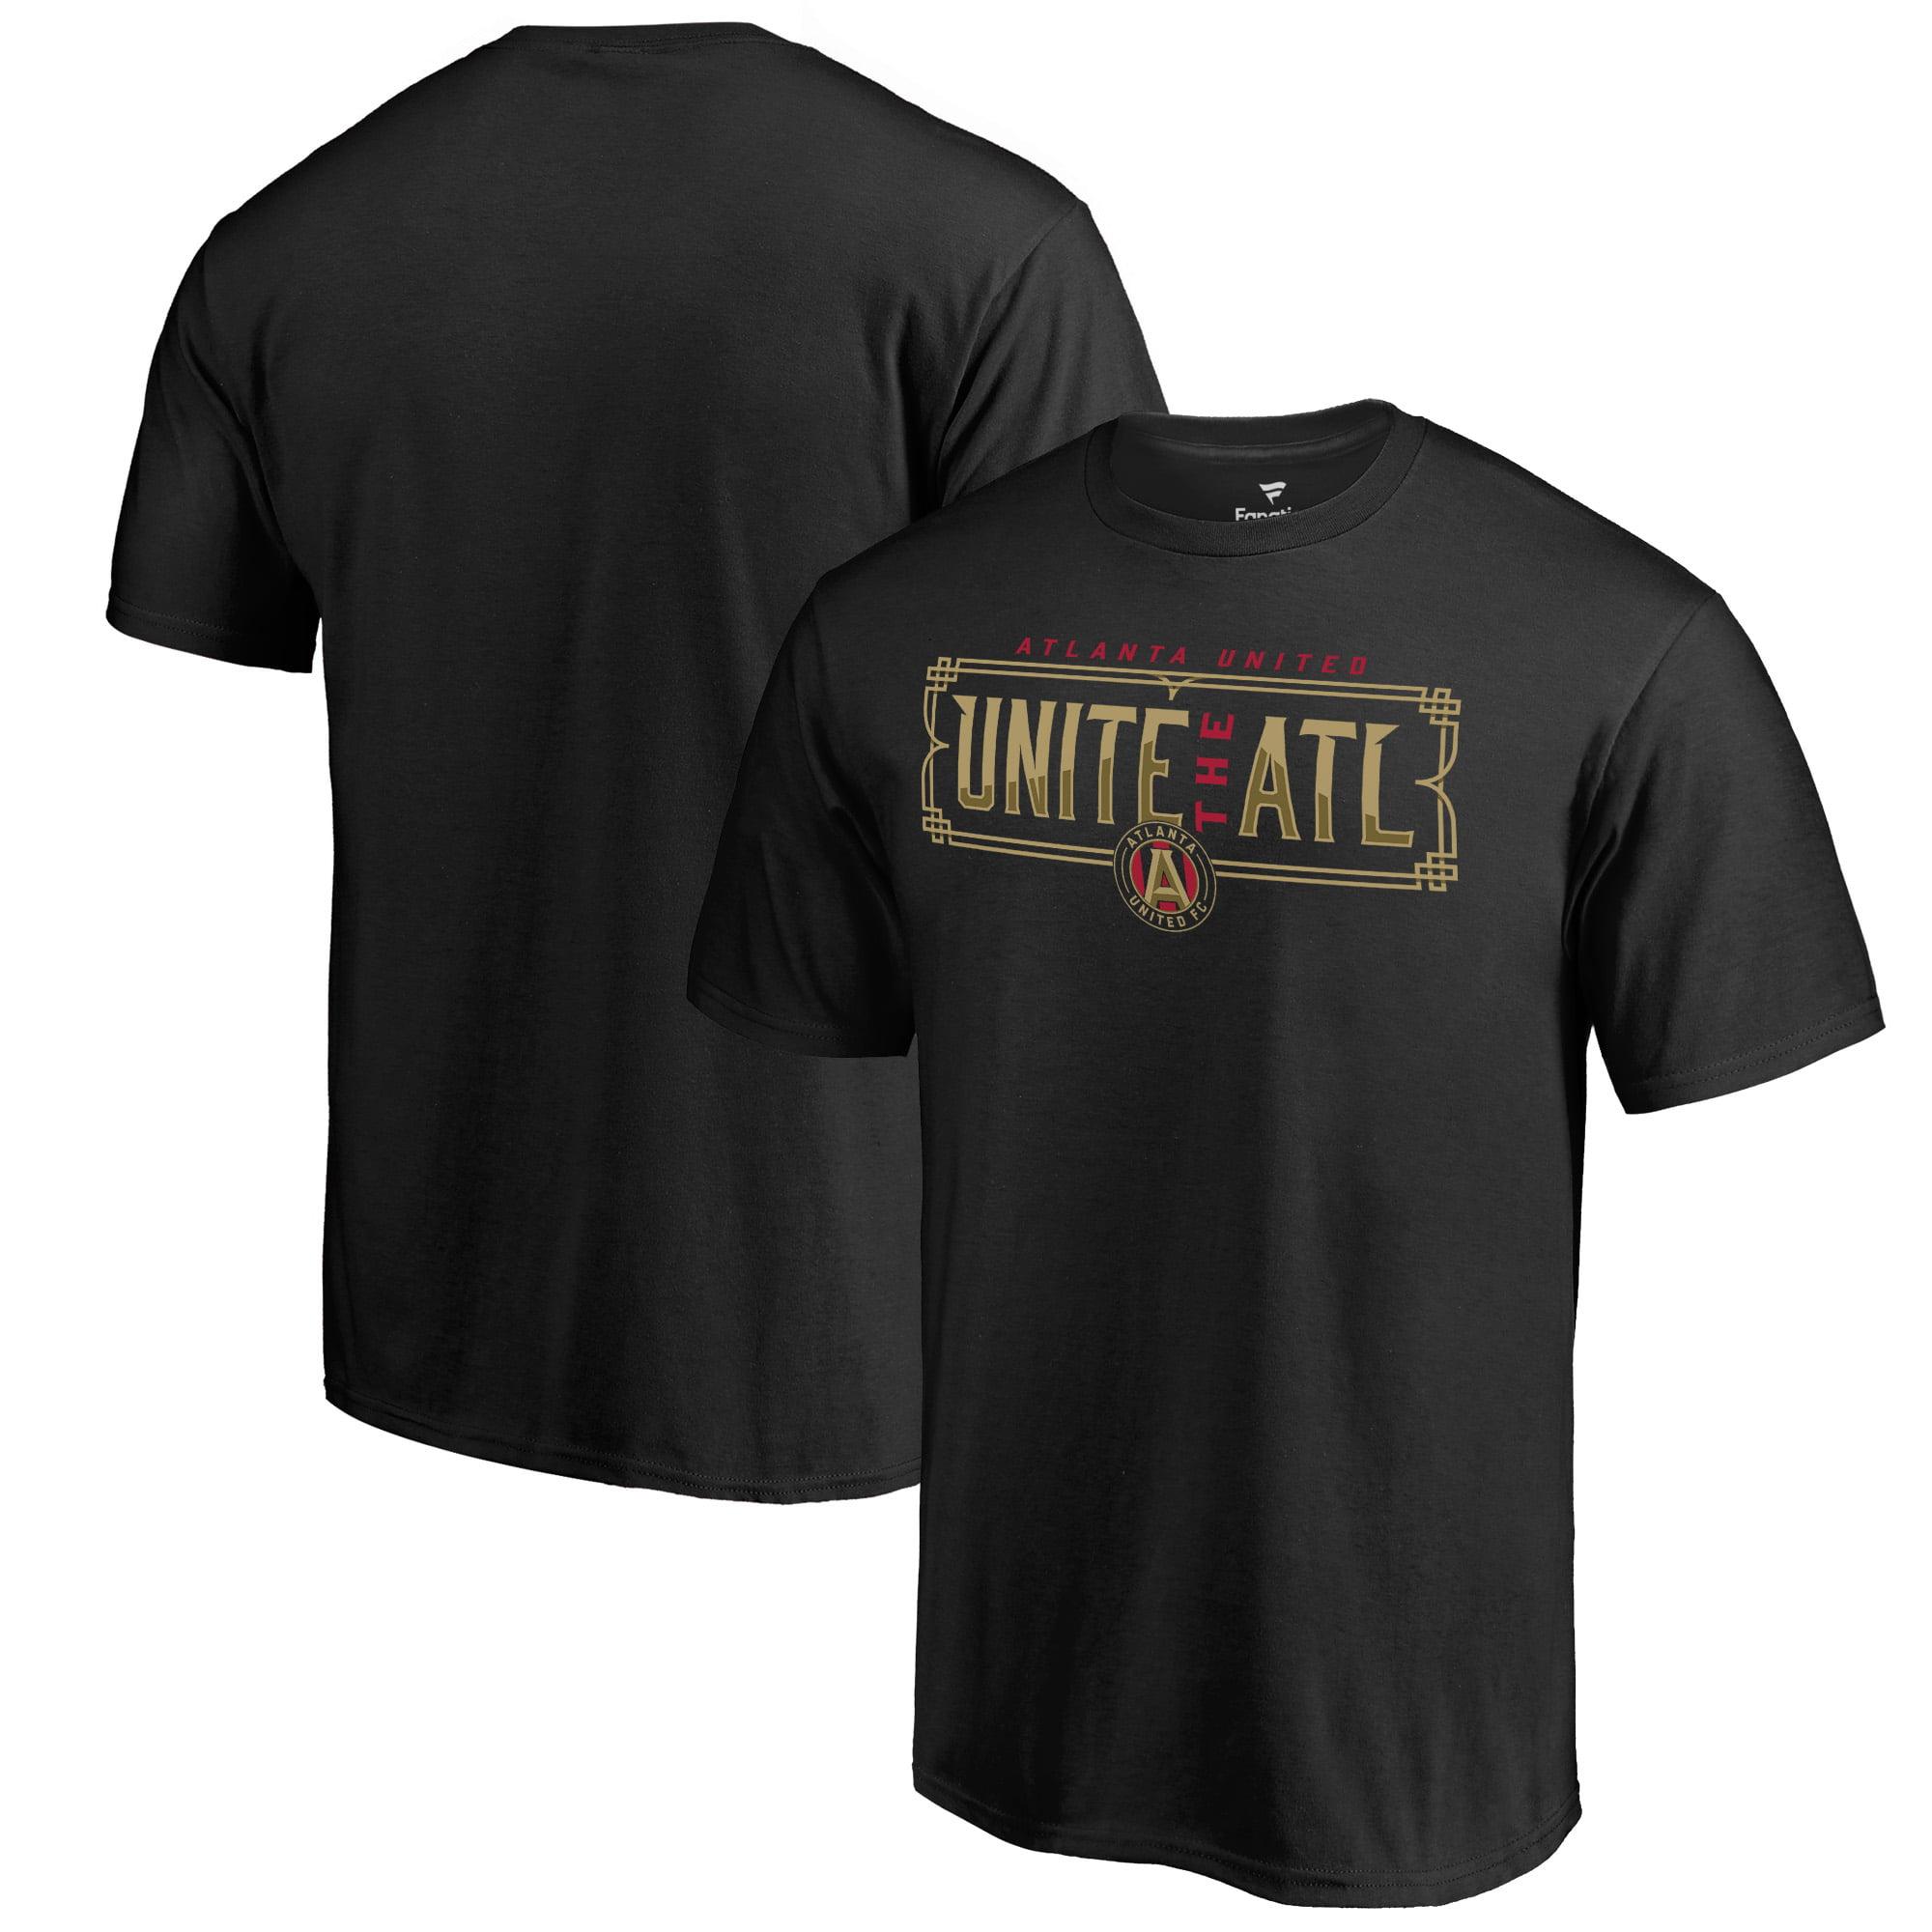 Atlanta United FC Fanatics Branded Unite the ATL T-Shirt - Black